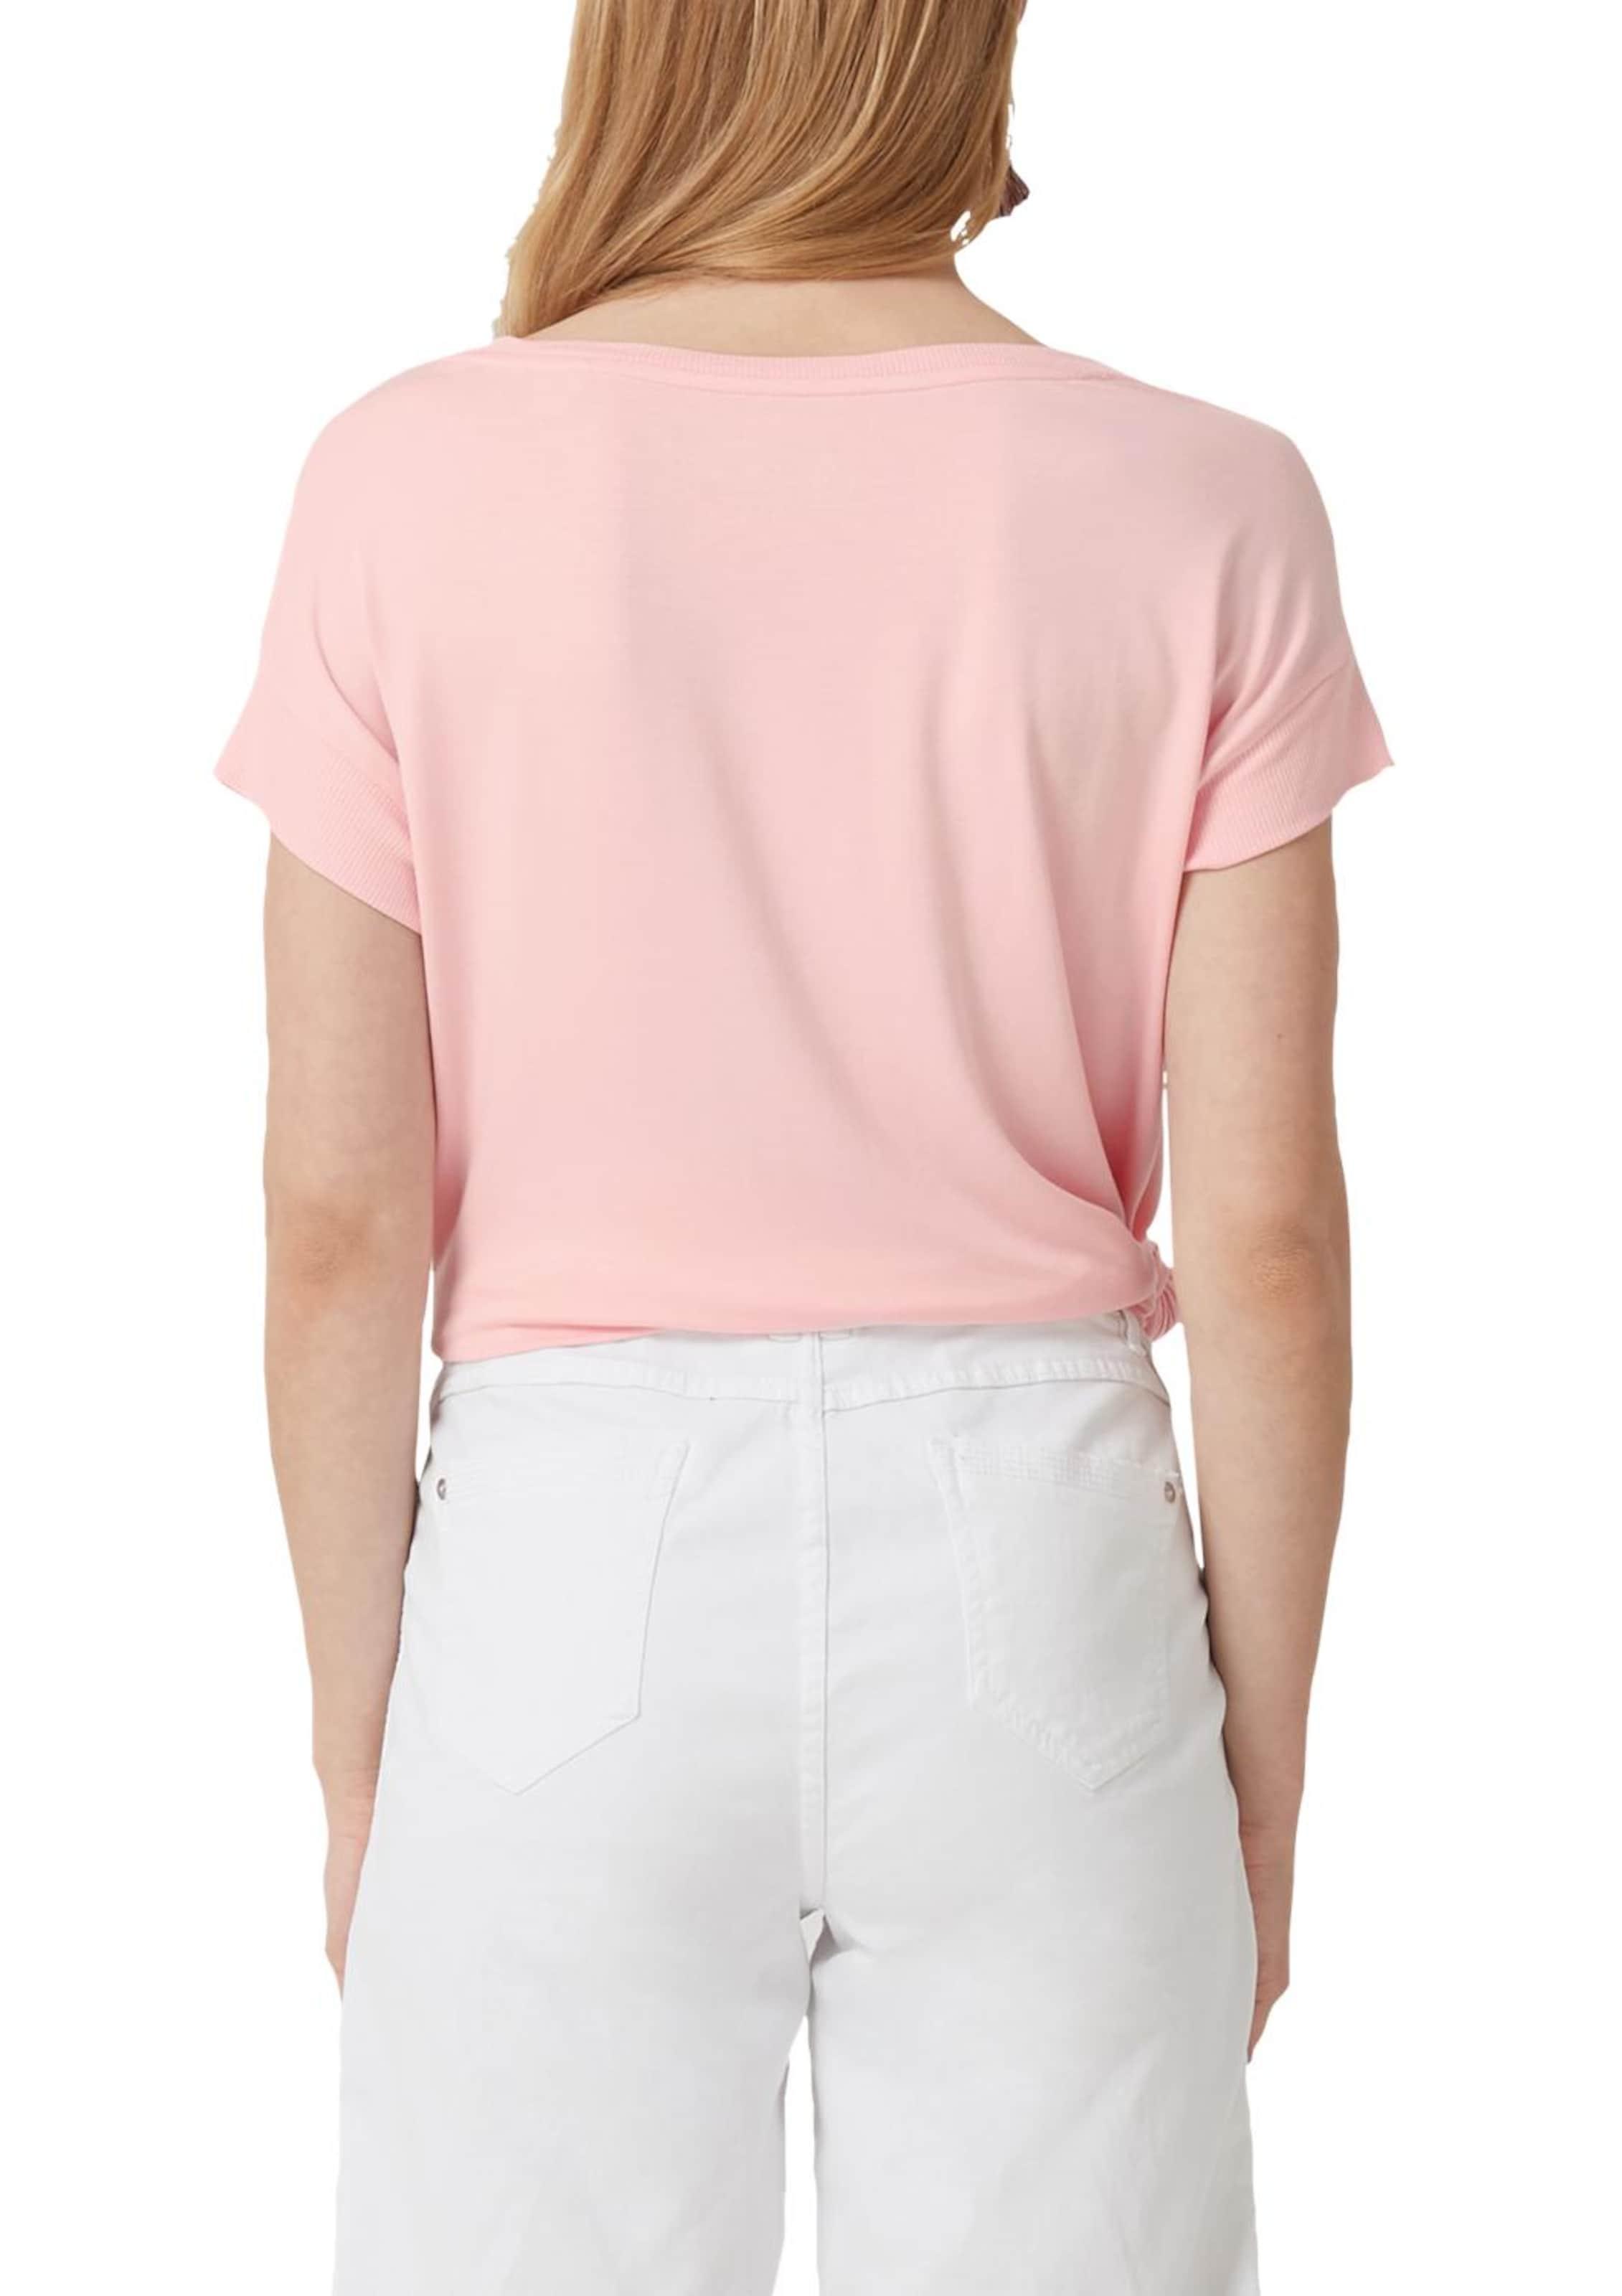 Shirt Pink oliver S Shirt S oliver In 7b6yfg